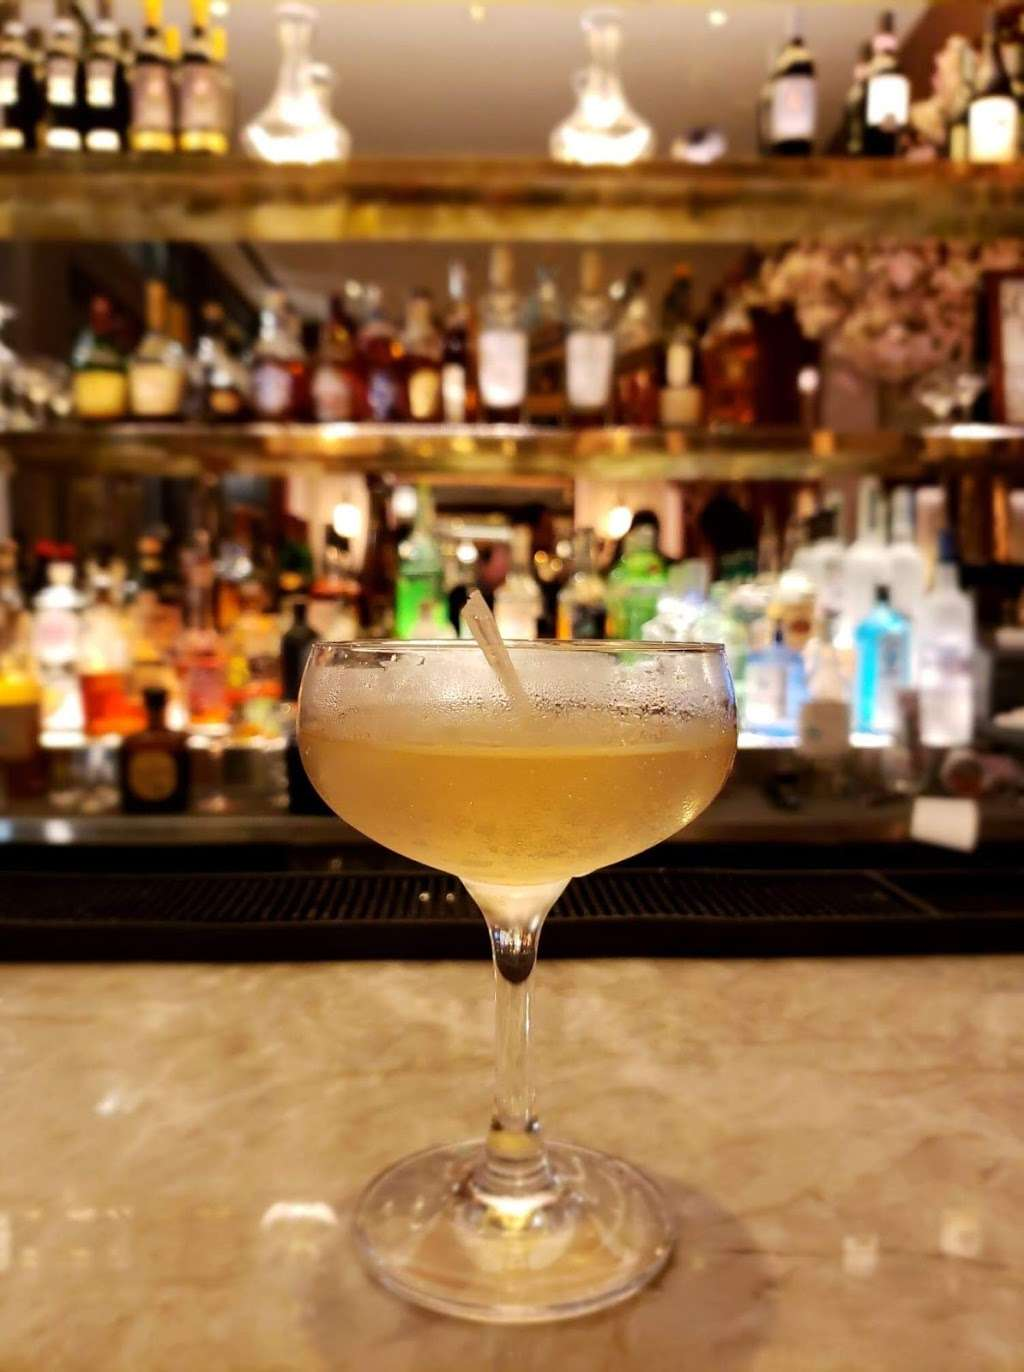 Bellini - restaurant  | Photo 3 of 10 | Address: 33 Peck Slip, New York, NY 10038, USA | Phone: (929) 263-0413